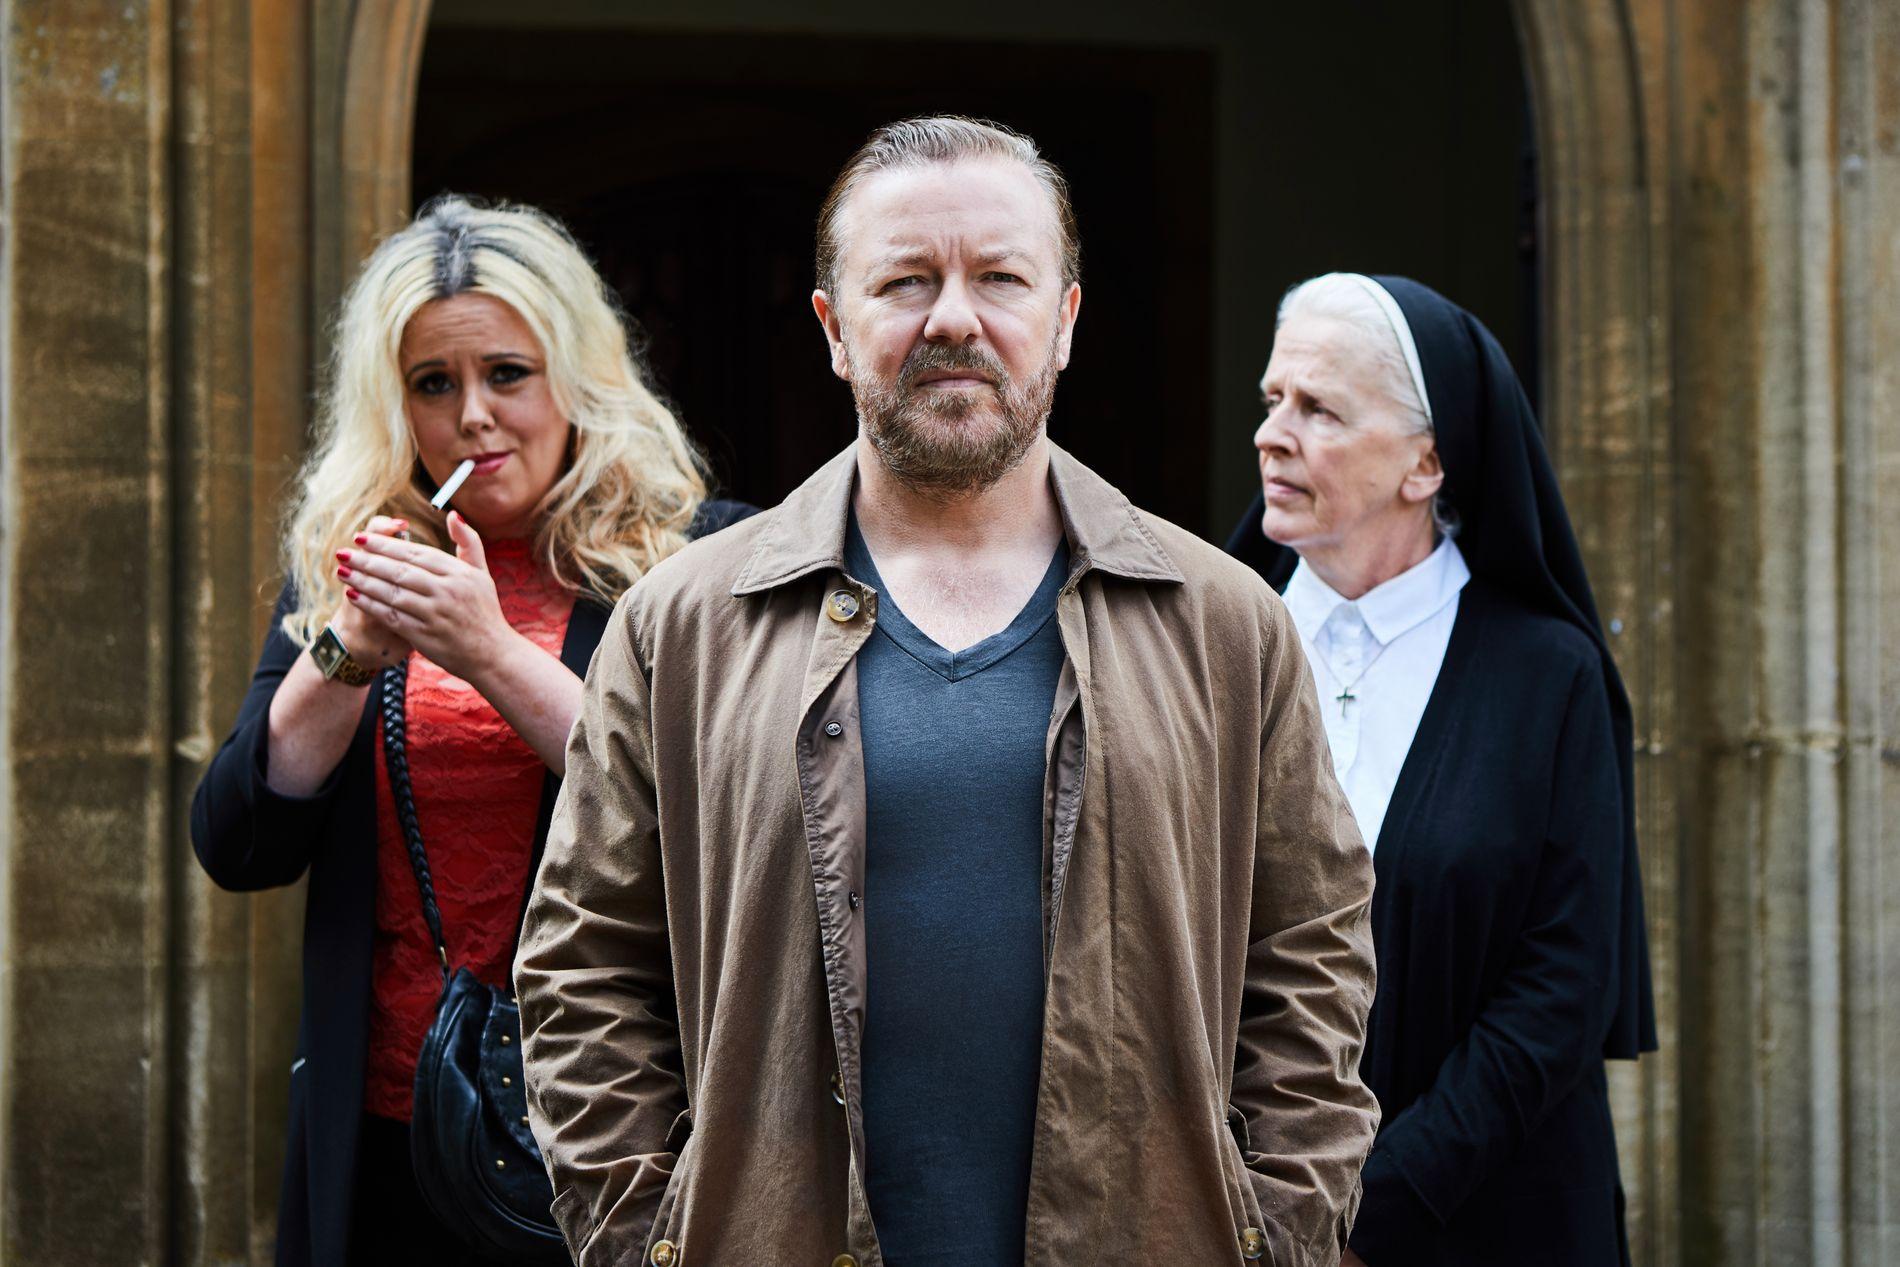 08a6f293 LEVERER: Ricky Gervais som Tony og Roisin Conaty (t.v.) som Roxy. Foto:  Natalie Seery / Netflix. «